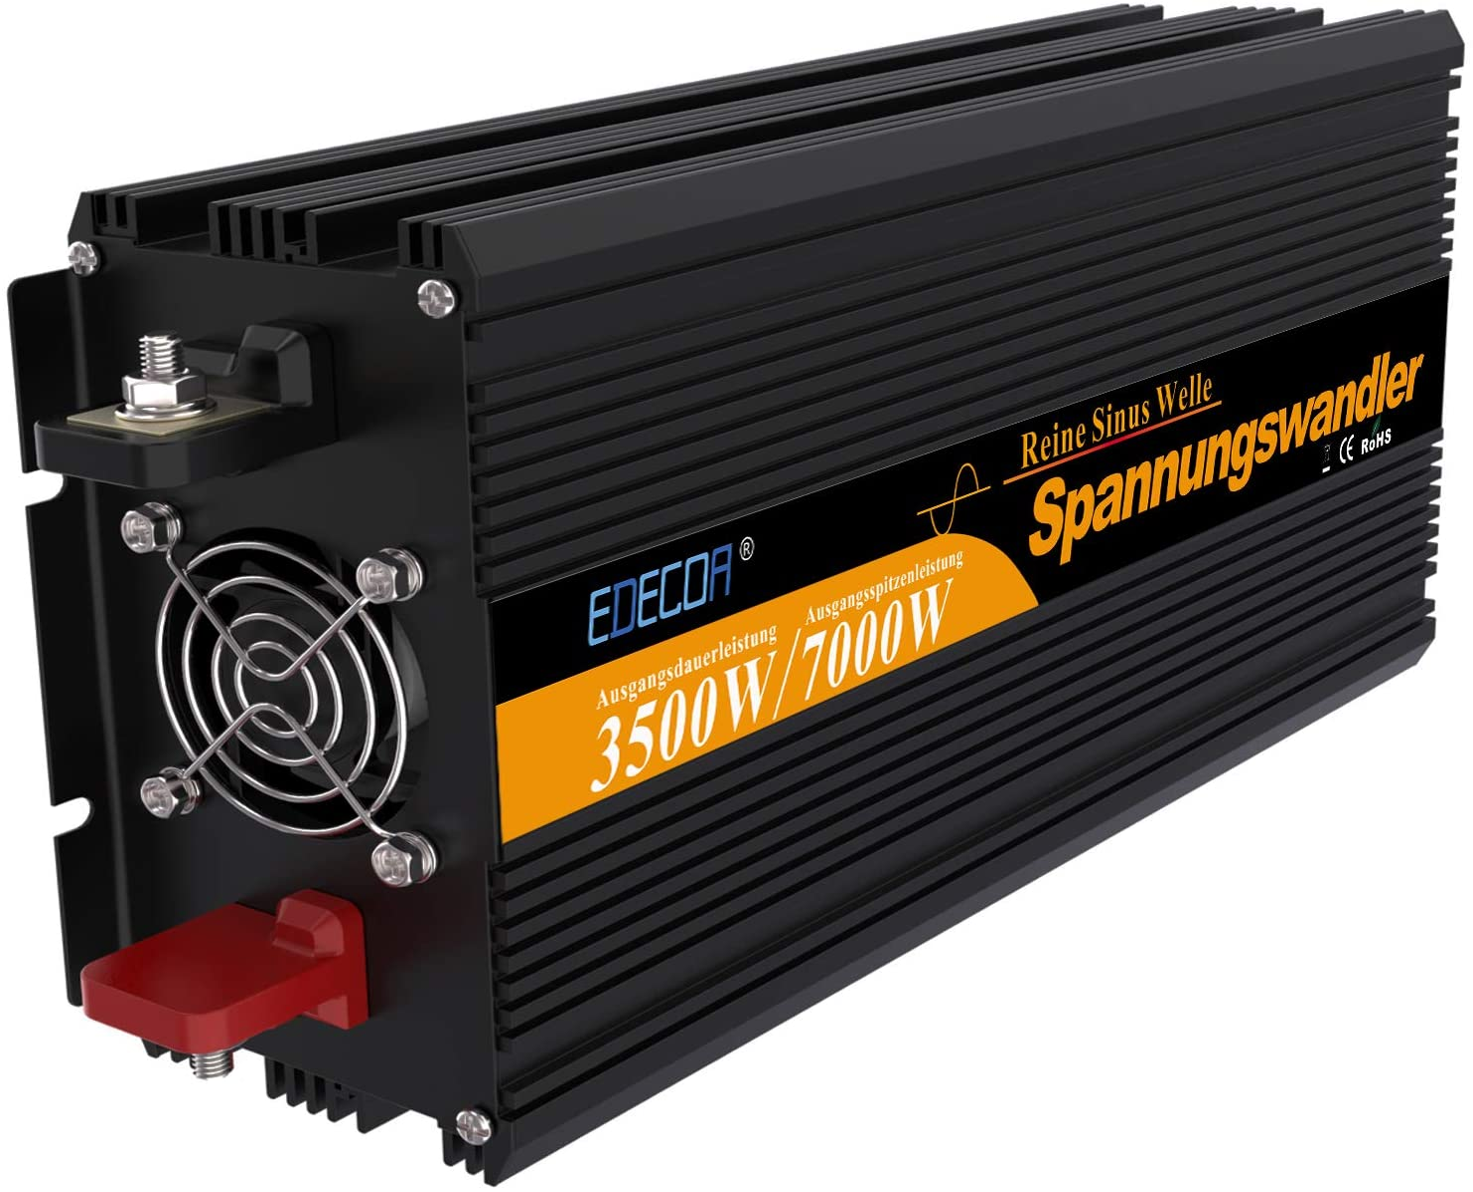 inversor de corriente 3500 7000w convertidor de voltaje 12v 220v de onda sinusoidal pura